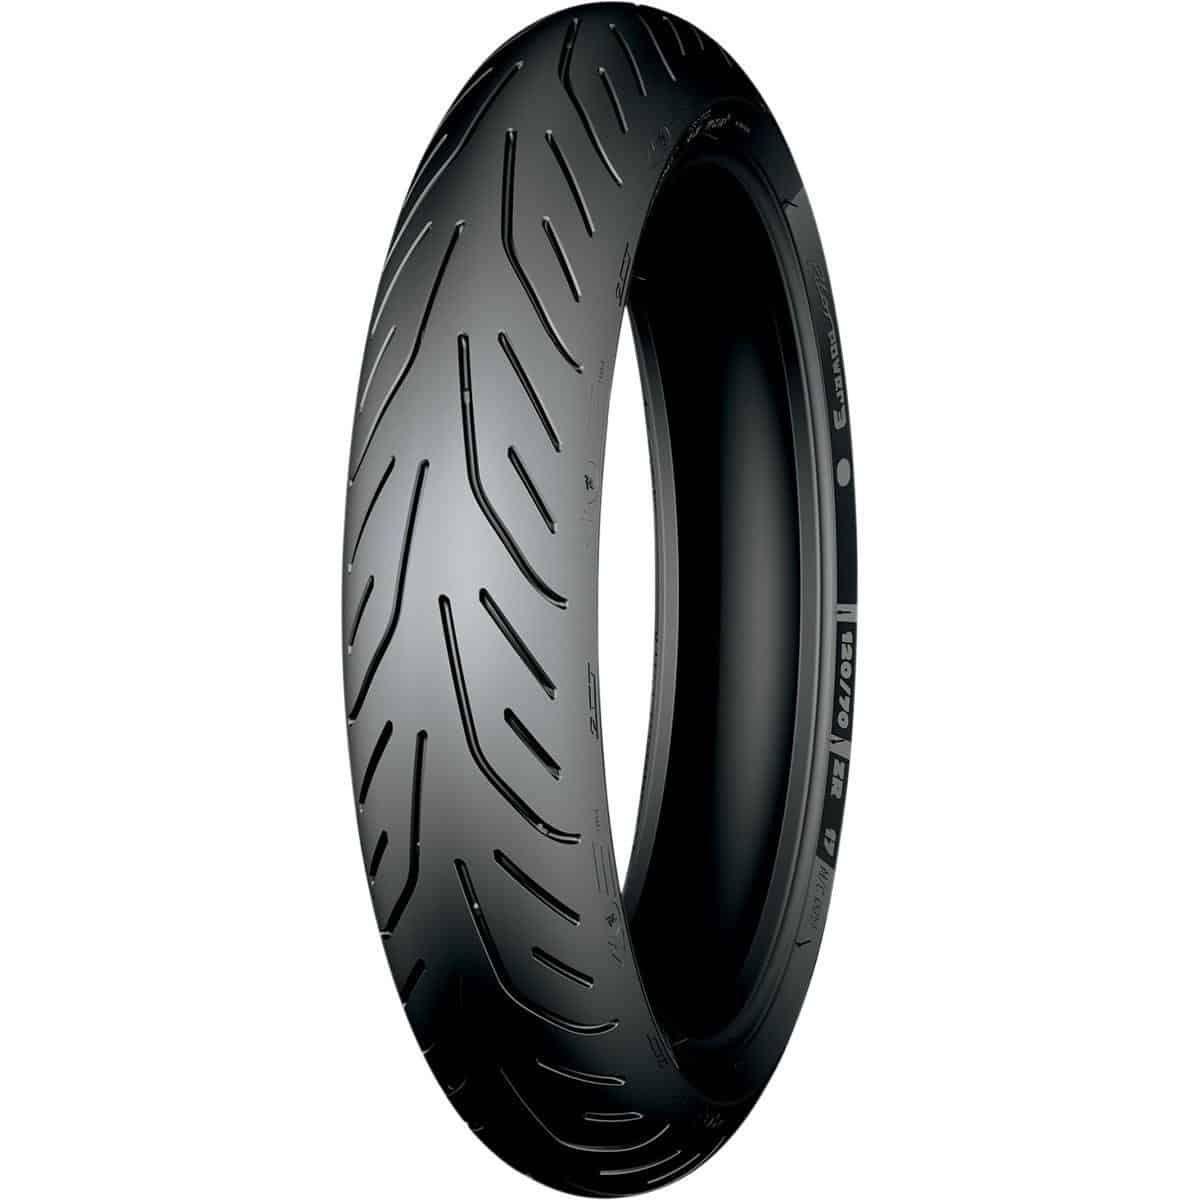 Top 10 Best Michelin Motorcycle Tires In 2020 Motorcycle Tires Michelin Tires Tires For Sale